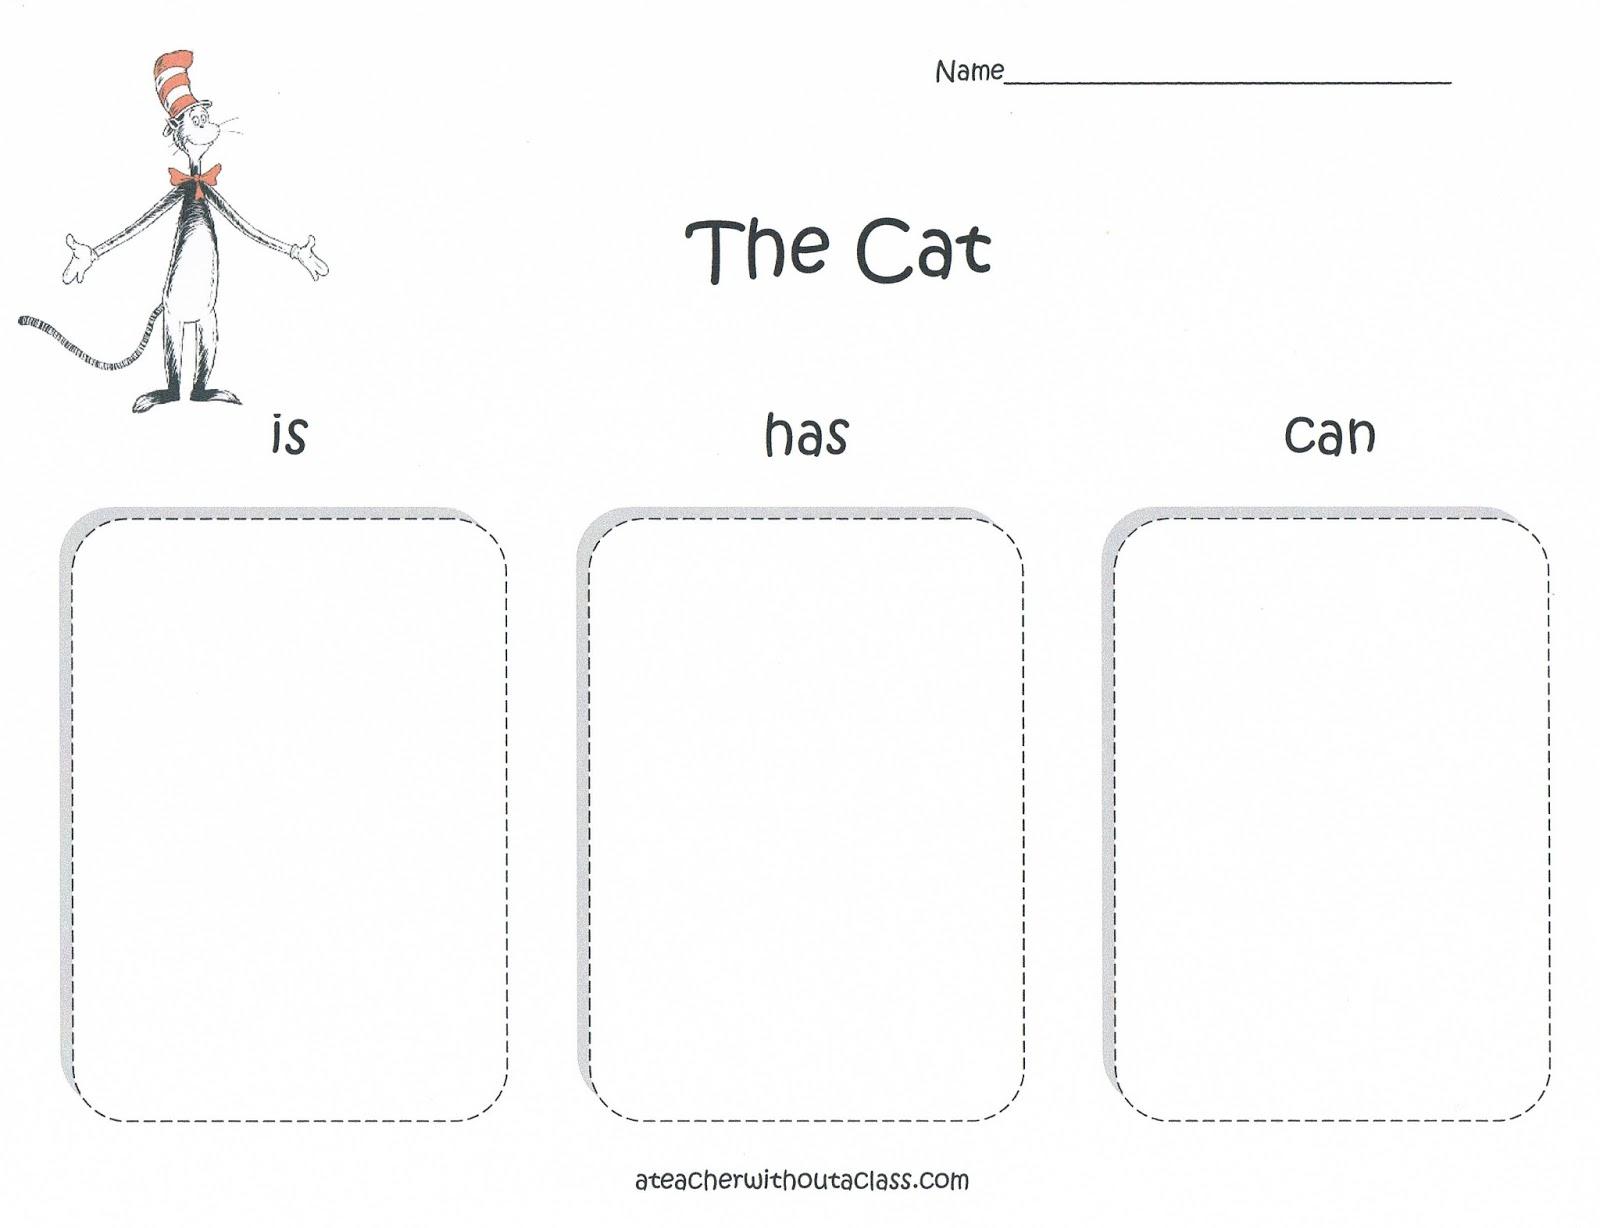 Worksheet Cat In The Hat Worksheets Grass Fedjp